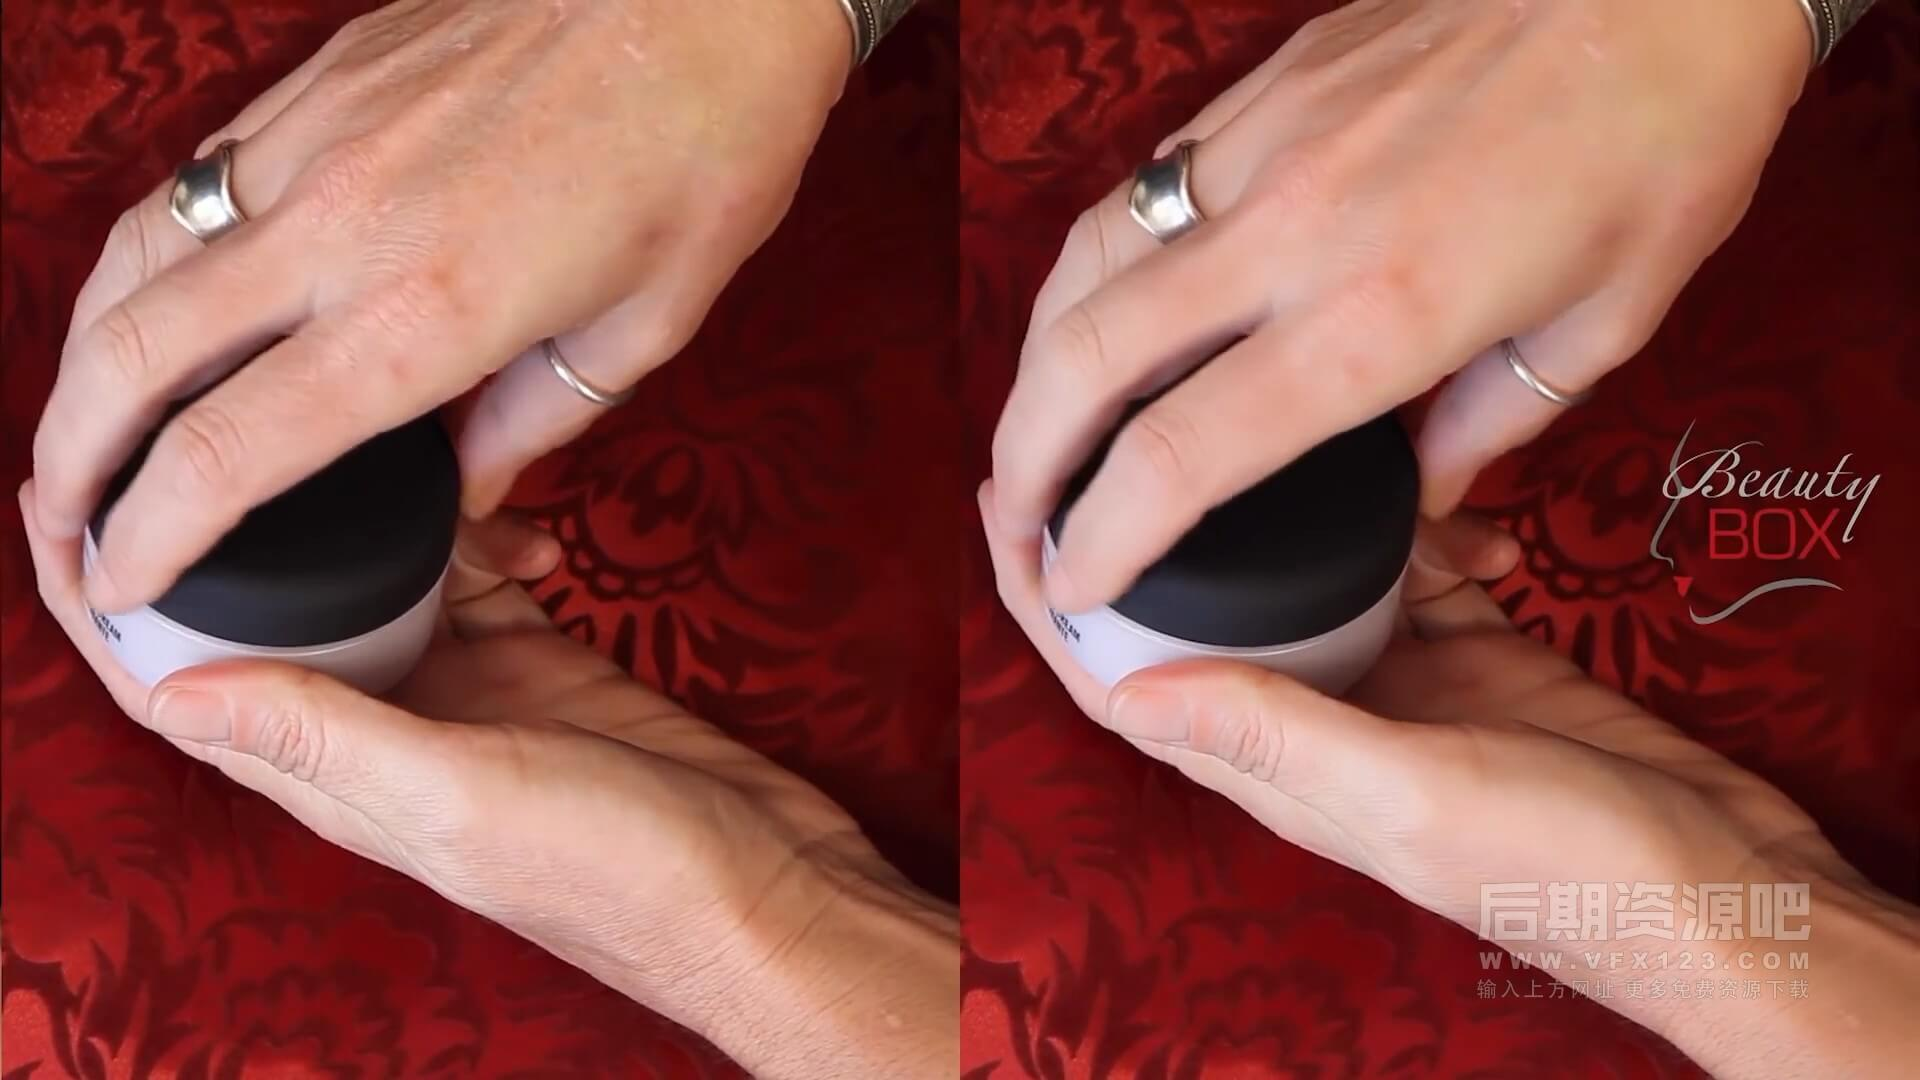 fcpx磨皮插件 美容磨皮美肤效果工具 亲测可用中文版 Digital Anarchy Beauty Box